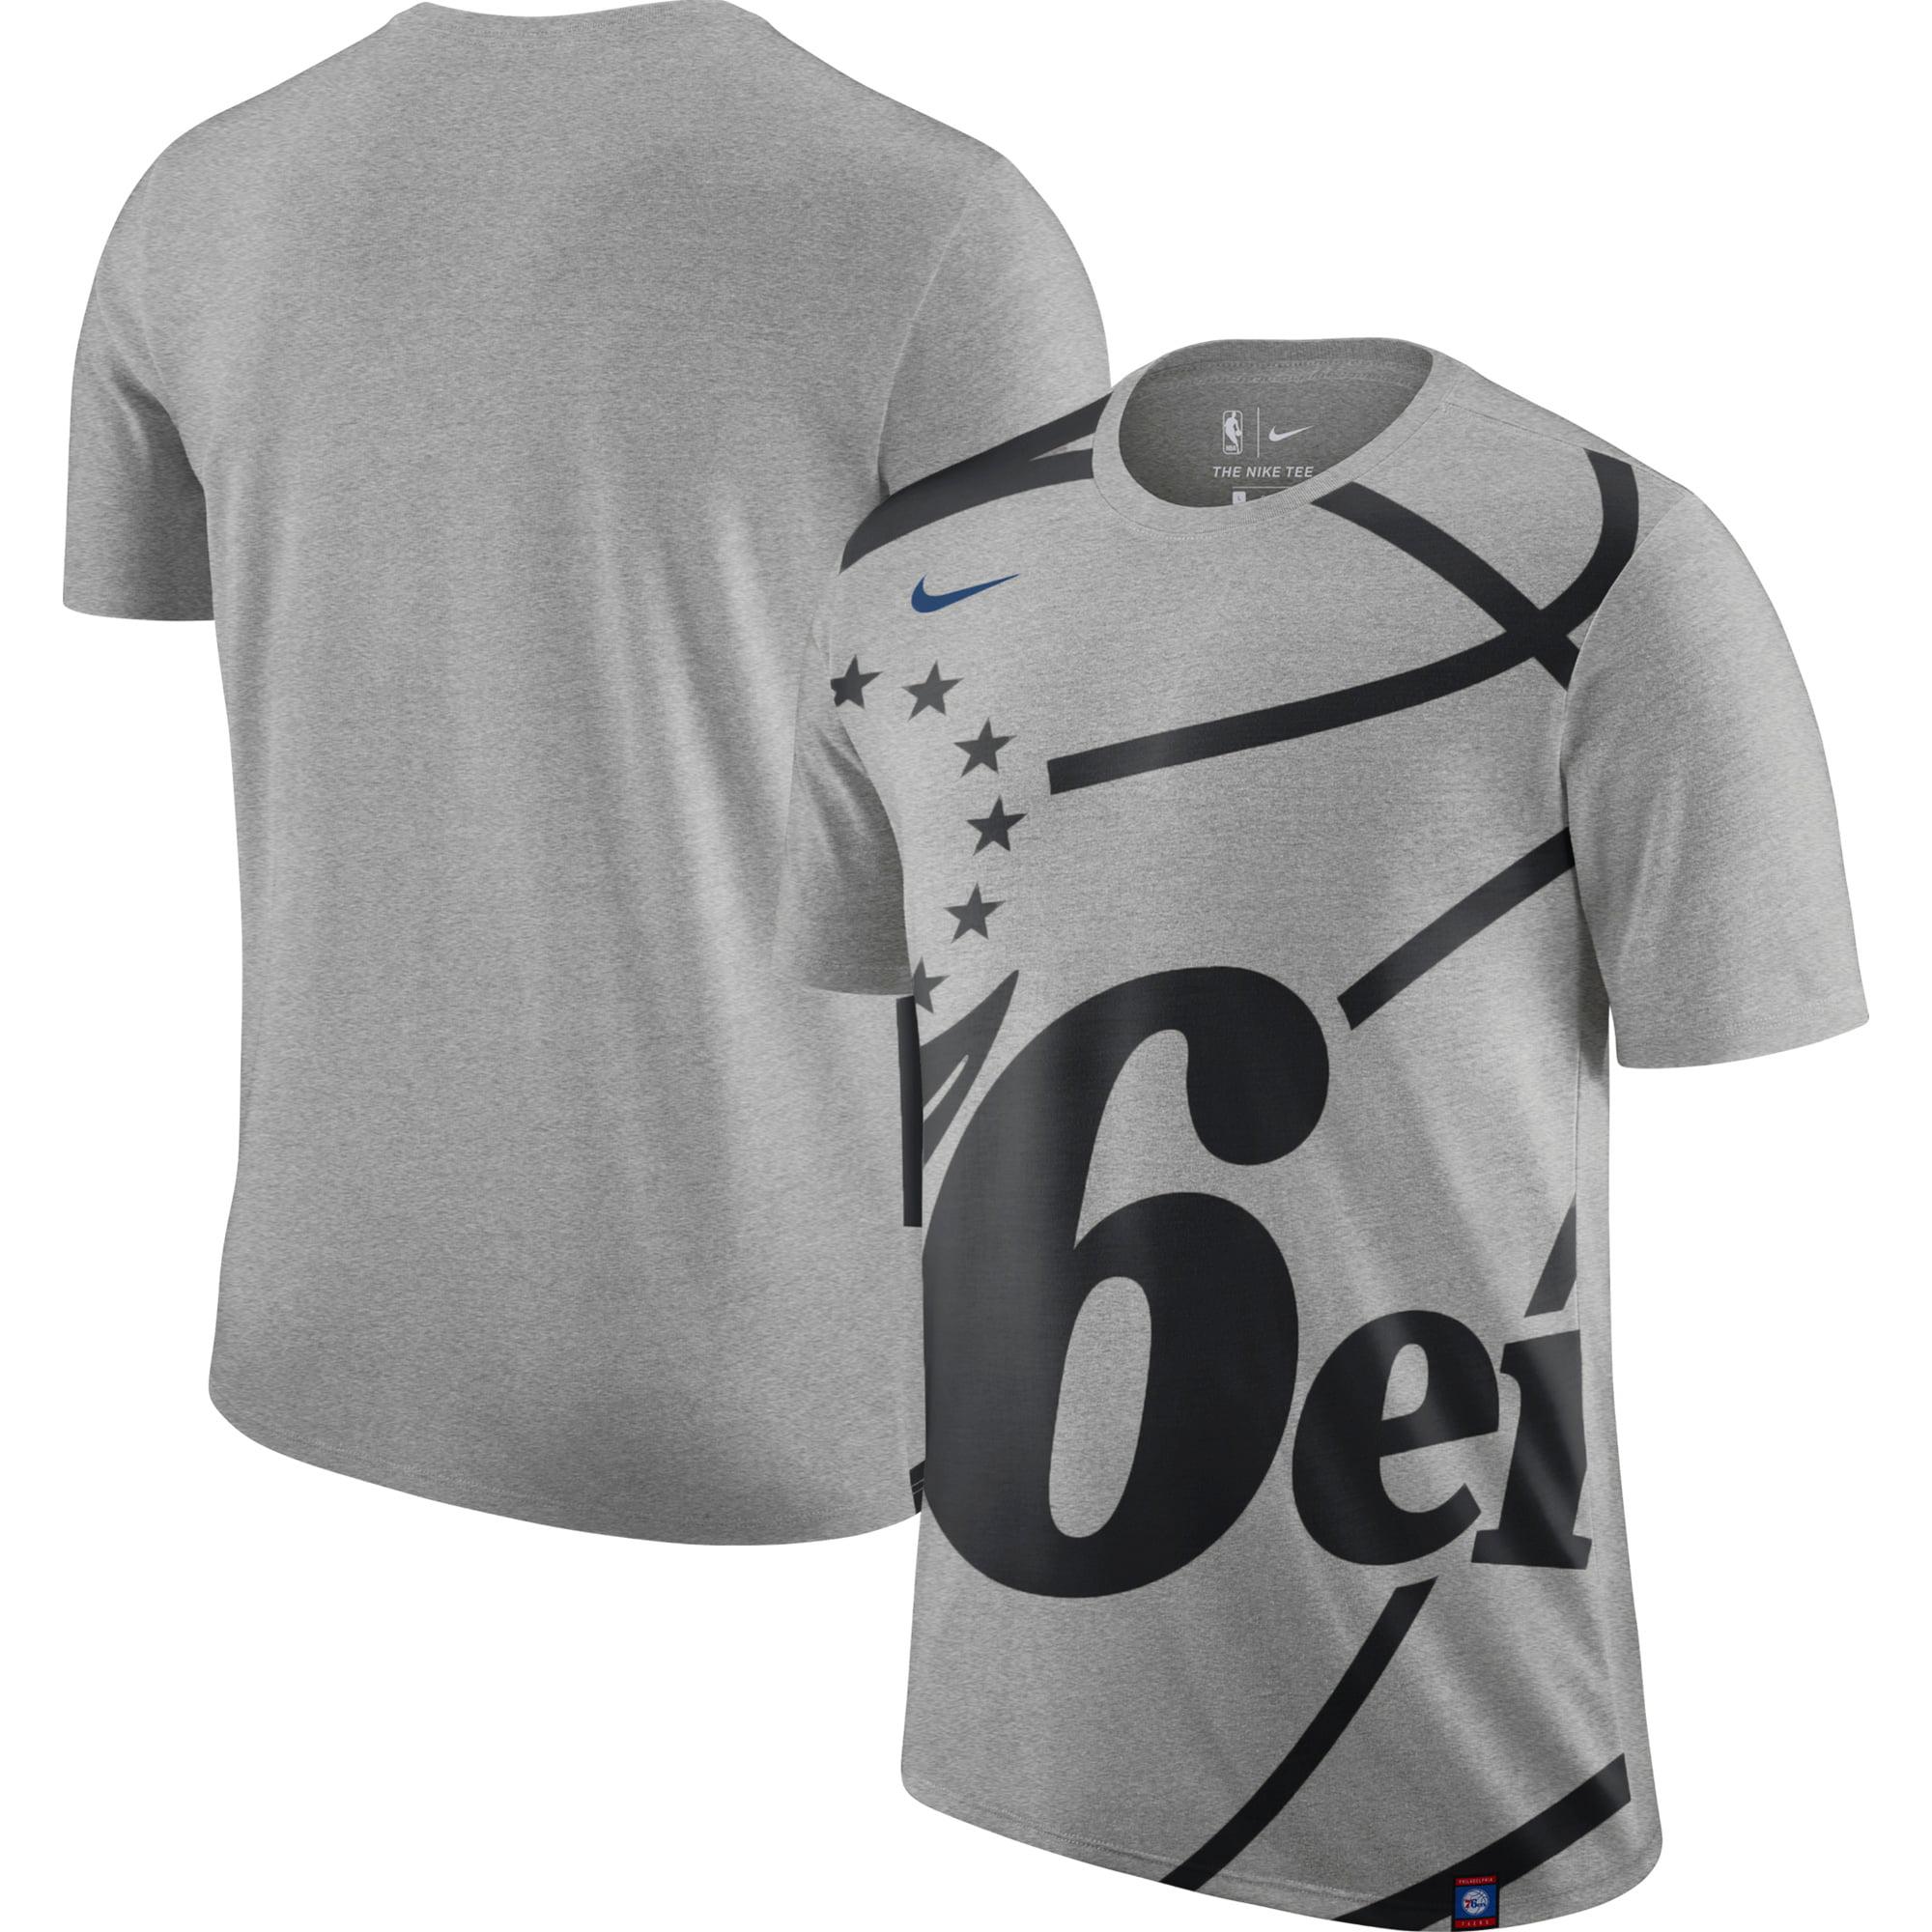 Philadelphia 76ers Nike Oversize Logo Performance Tri-Blend T-Shirt - Gray